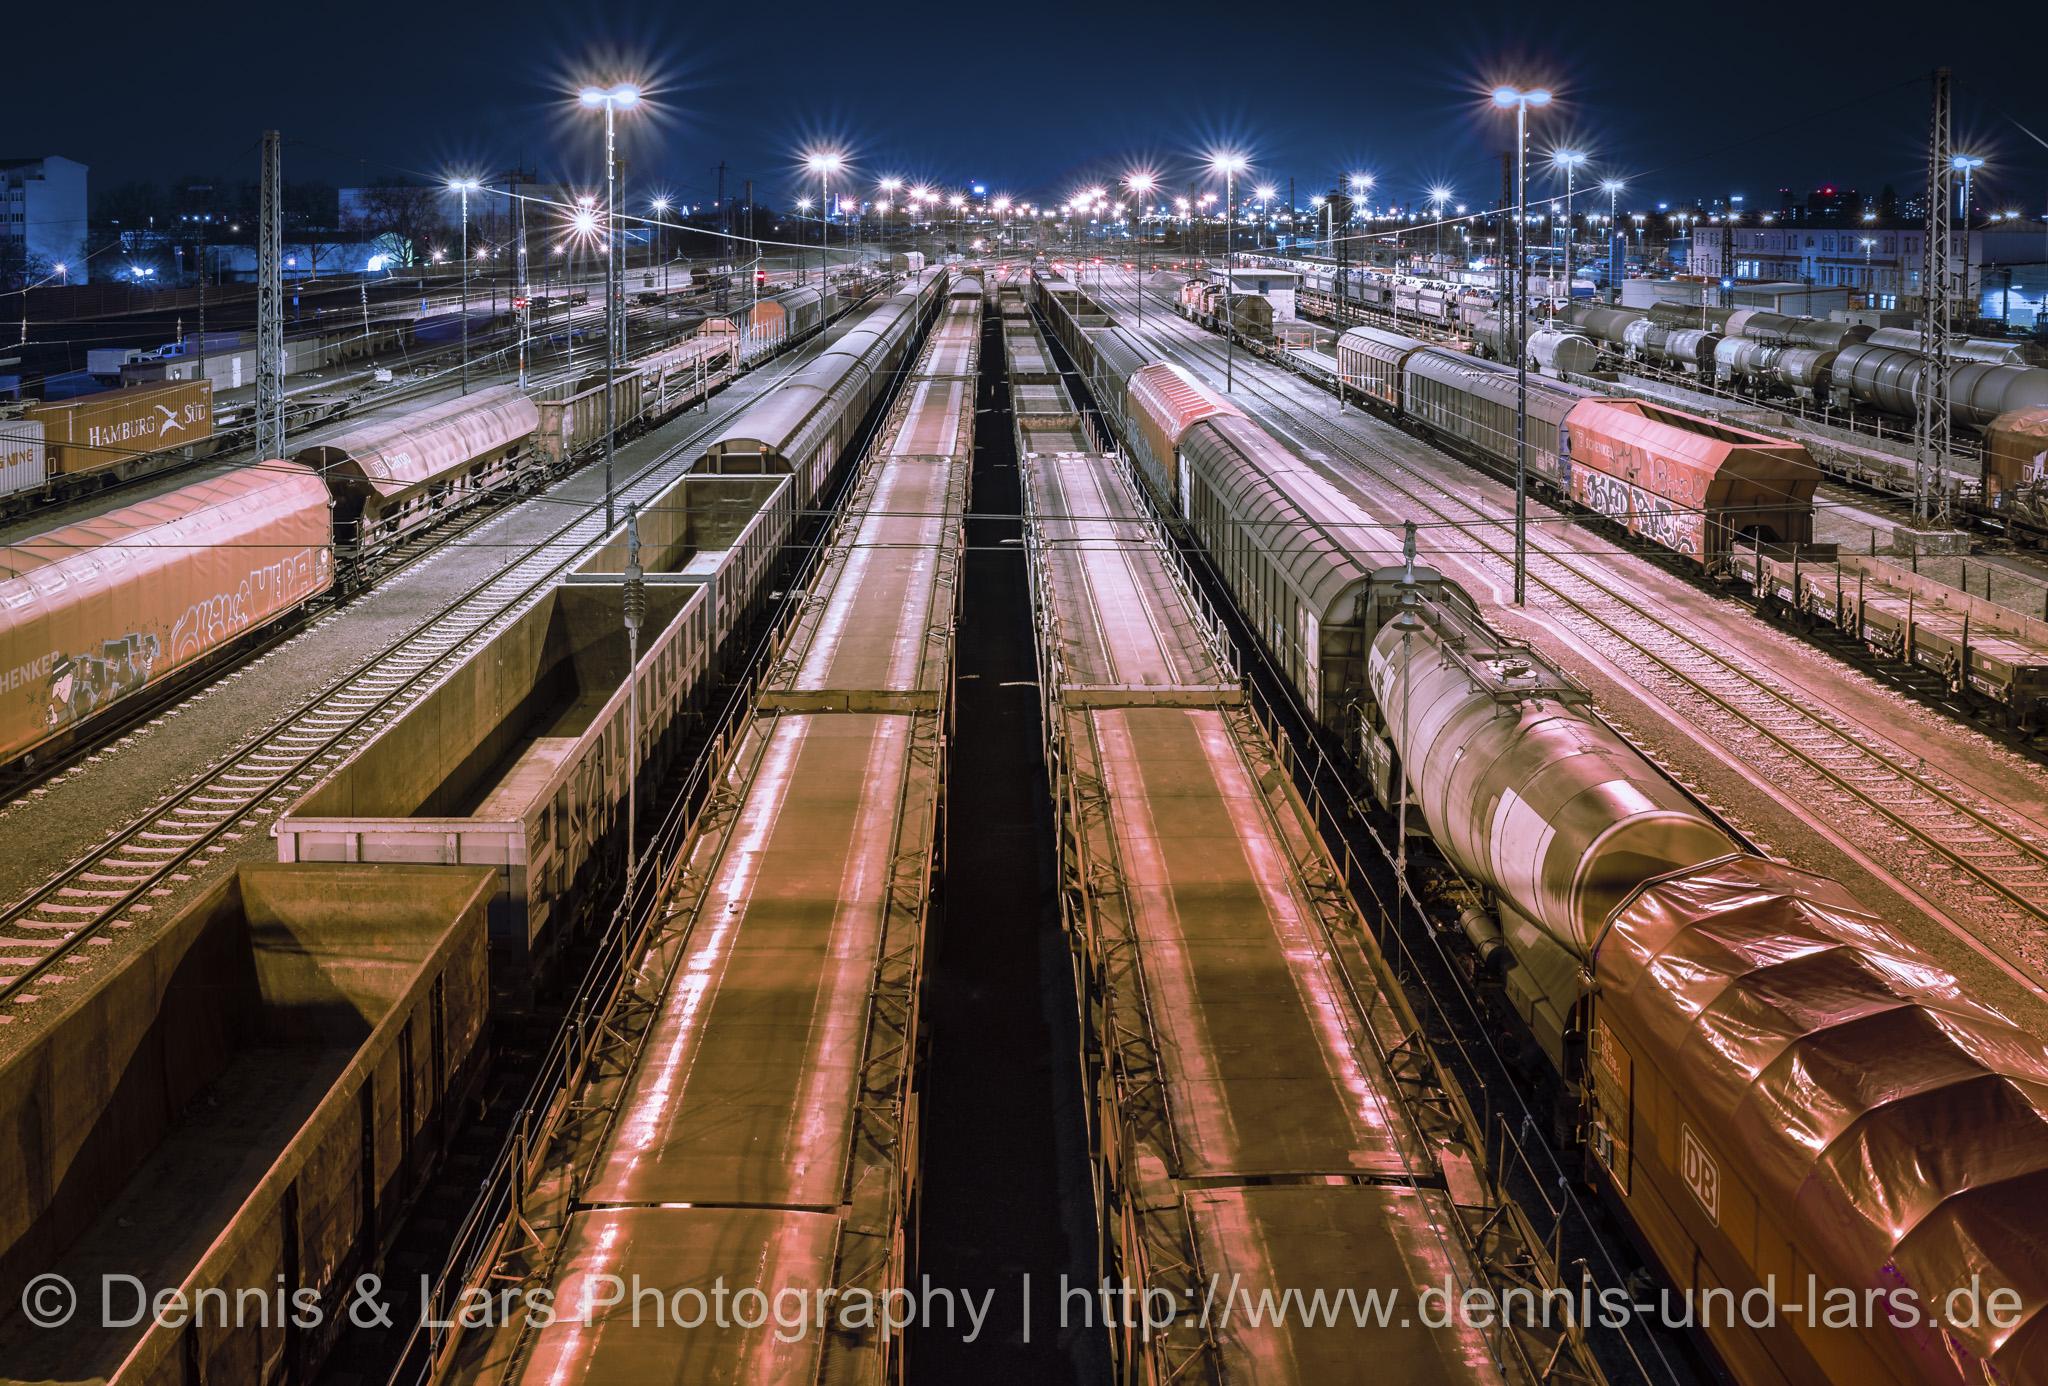 On the bridge at logistic train station Mannheim, Germany